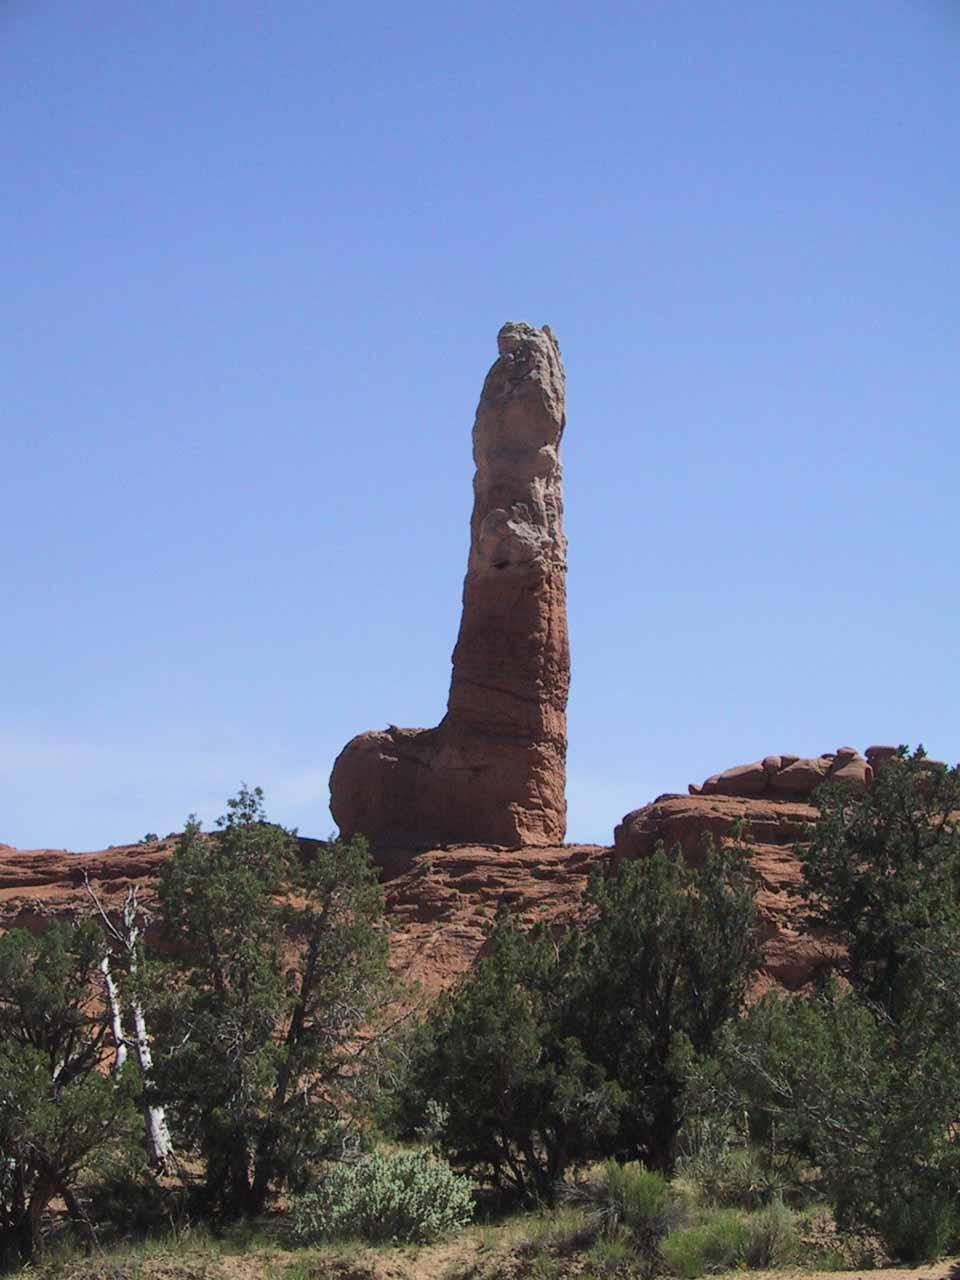 A phallic formation at Kodachrome Basin State Park